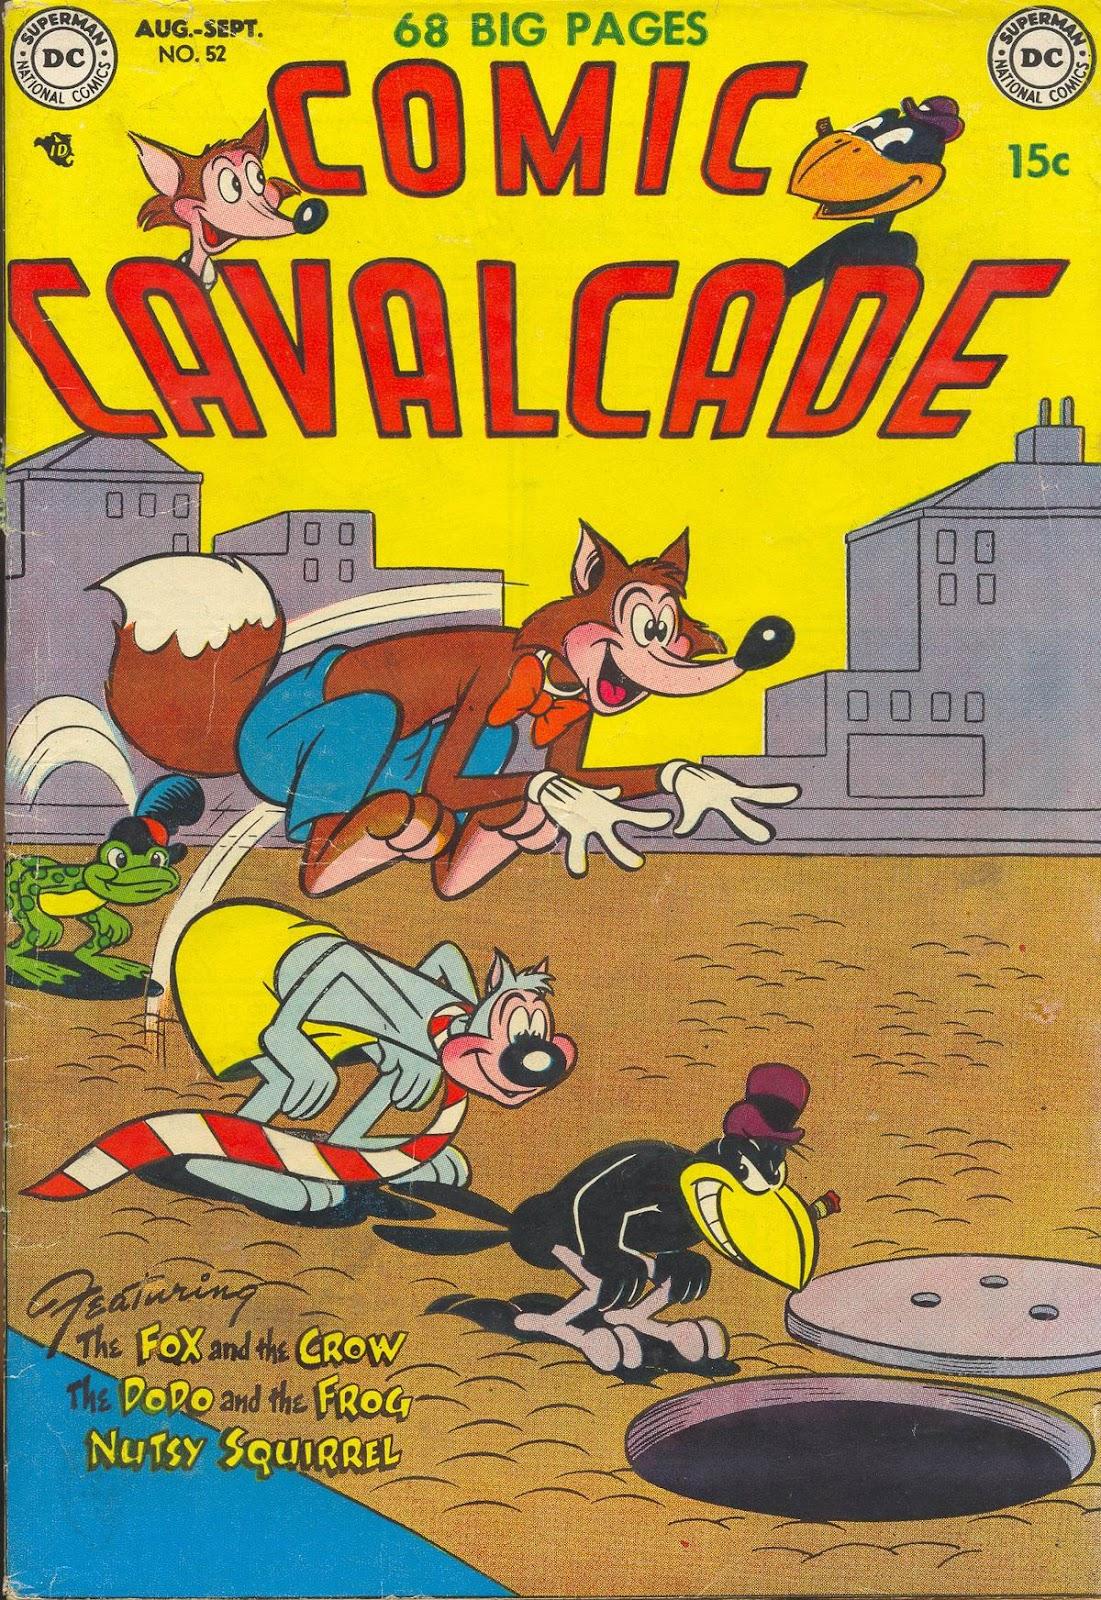 Comic Cavalcade issue 52 - Page 1